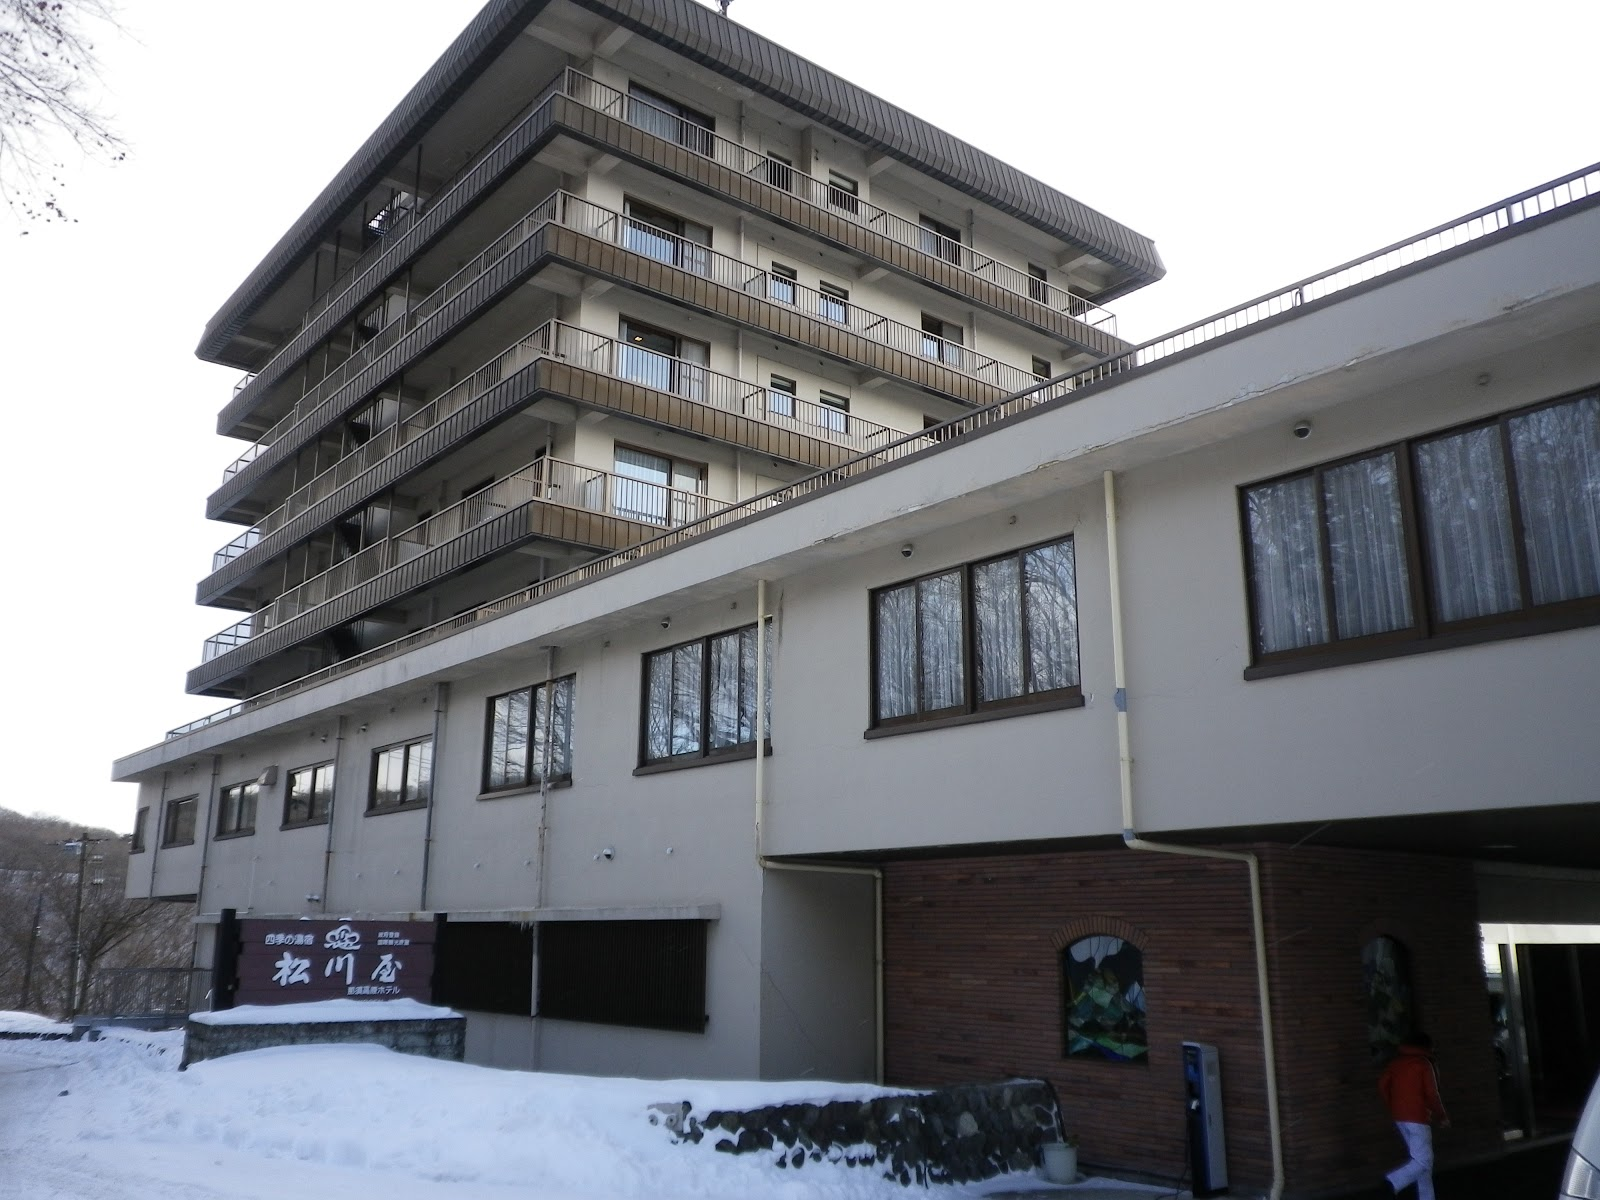 那須 松川 ホテル 屋 高原